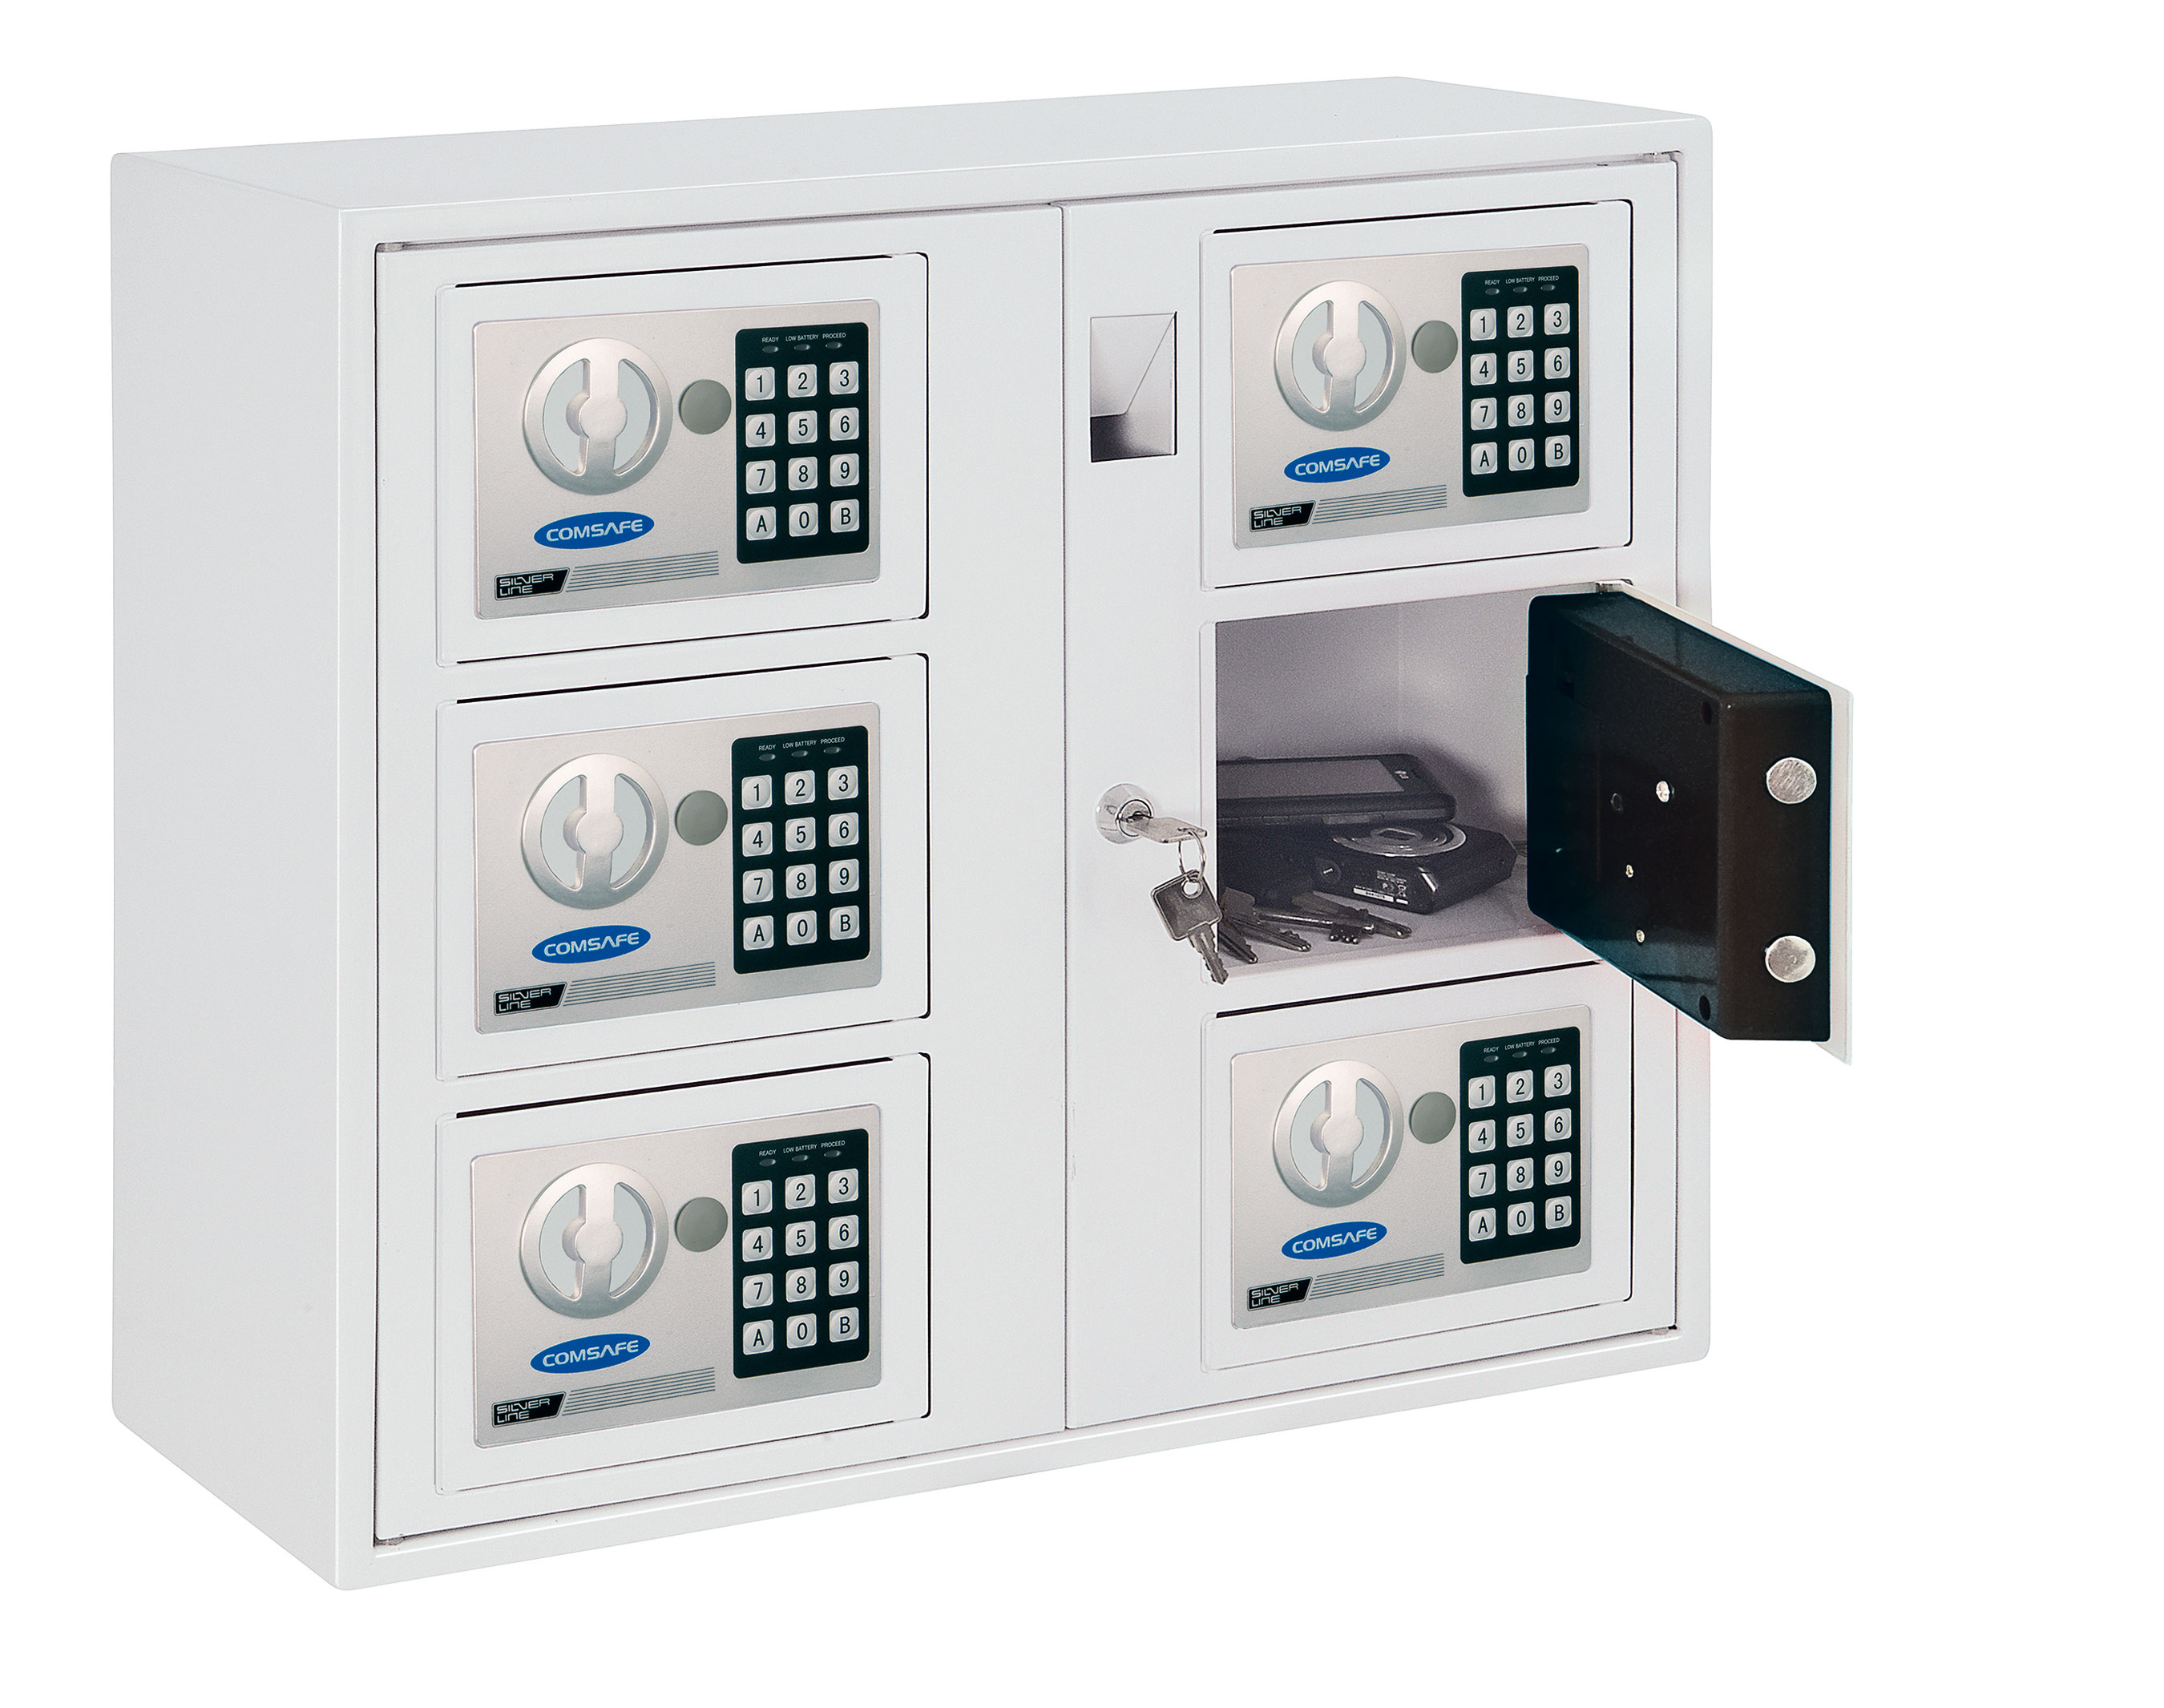 Rottner Schlüsselausgabe-System KeySystem 6 465x535x170mm Bild 1